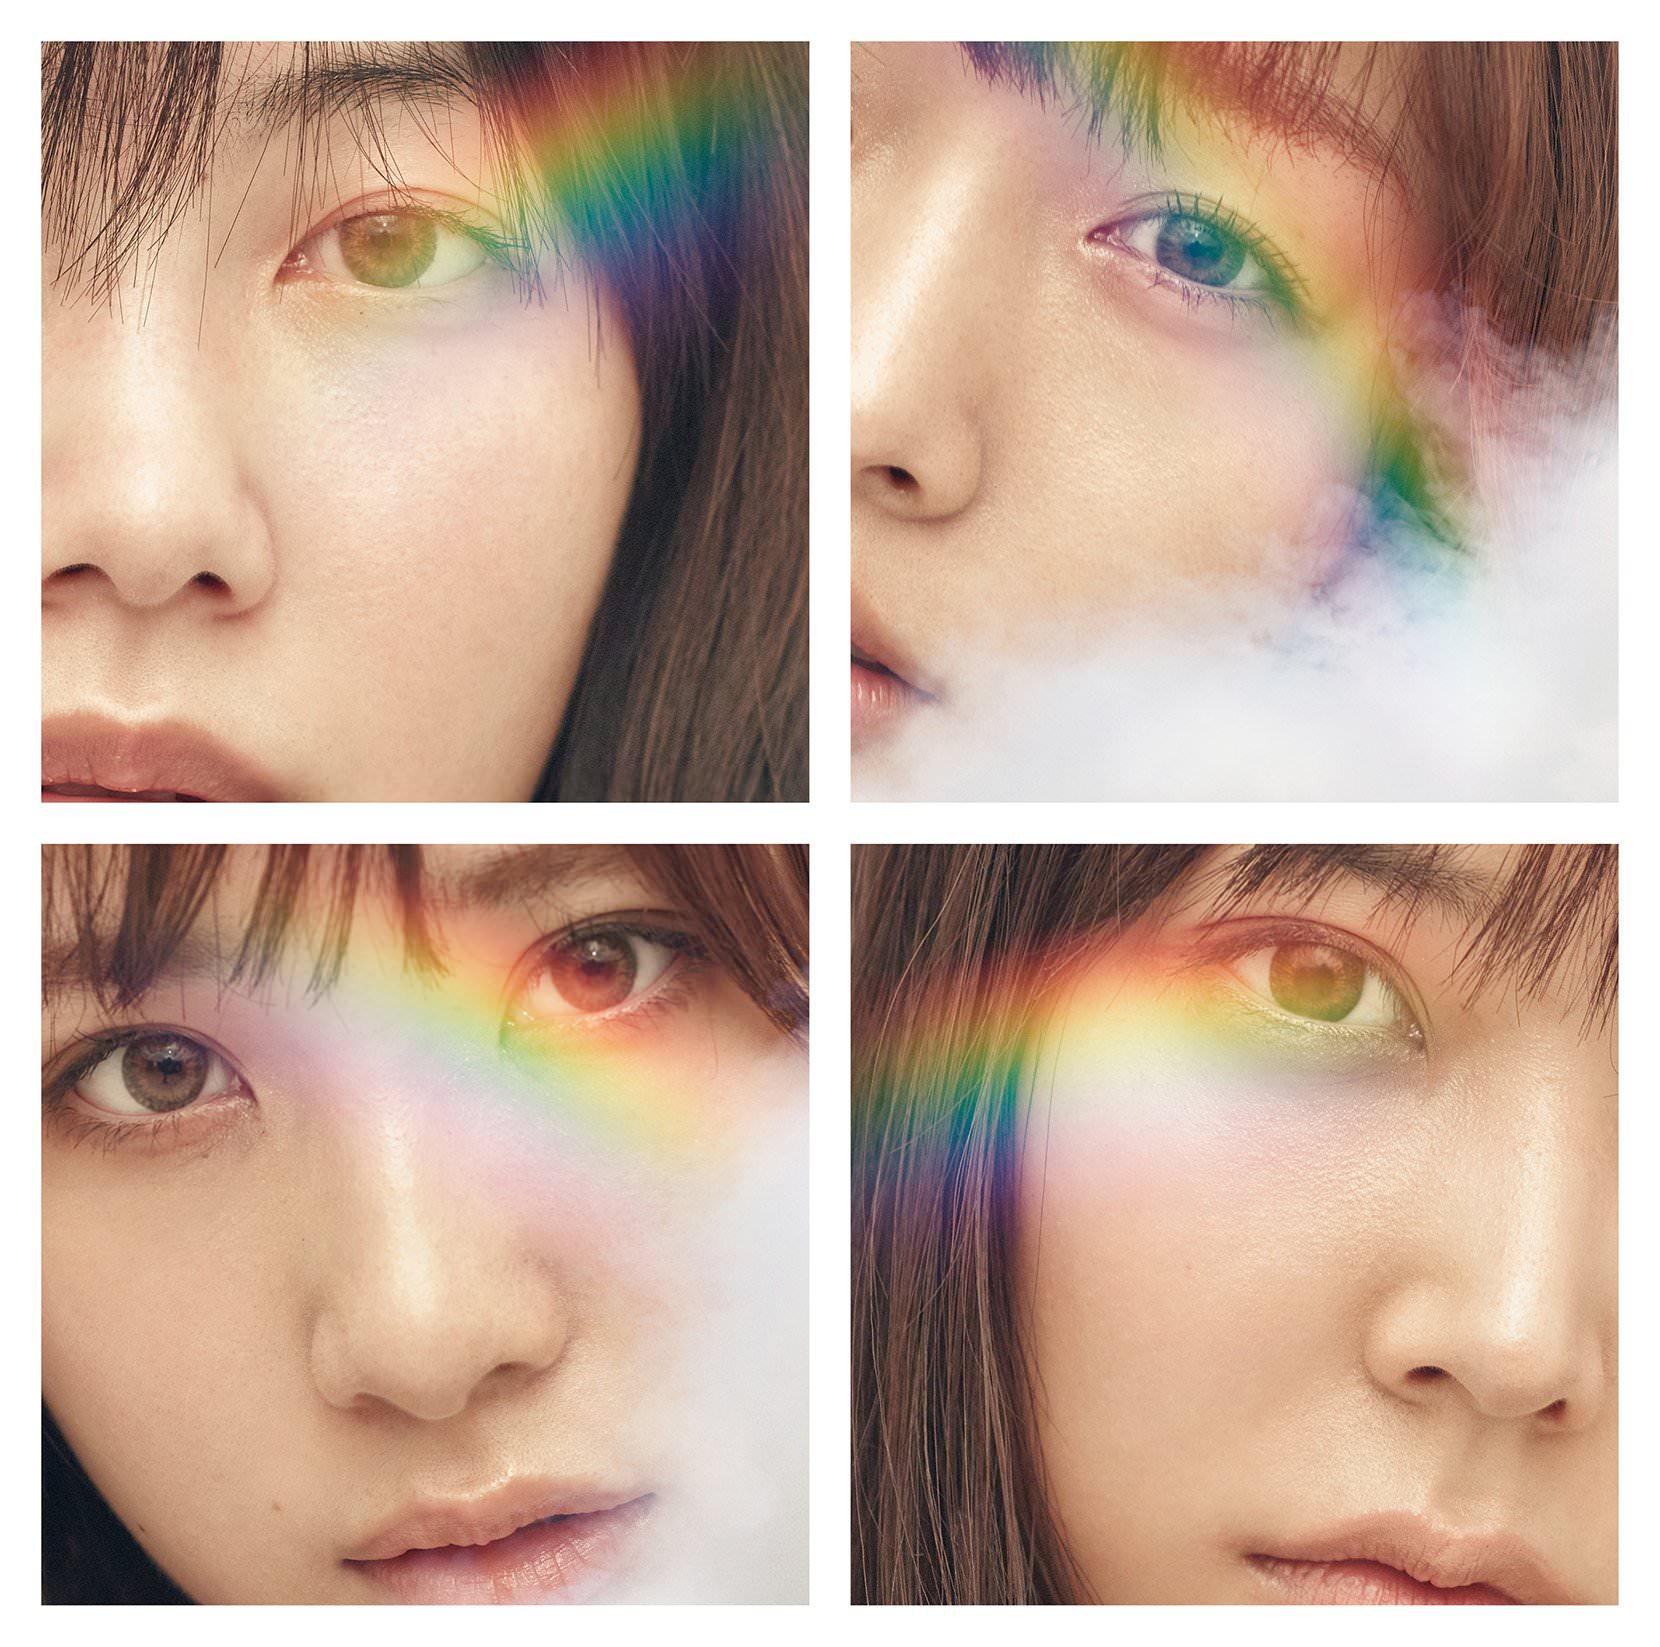 20180810.0048.10 AKB48 - 11gatsu no Anklet (Type D) (DVD) (JPOP.ru) cover 08.jpg